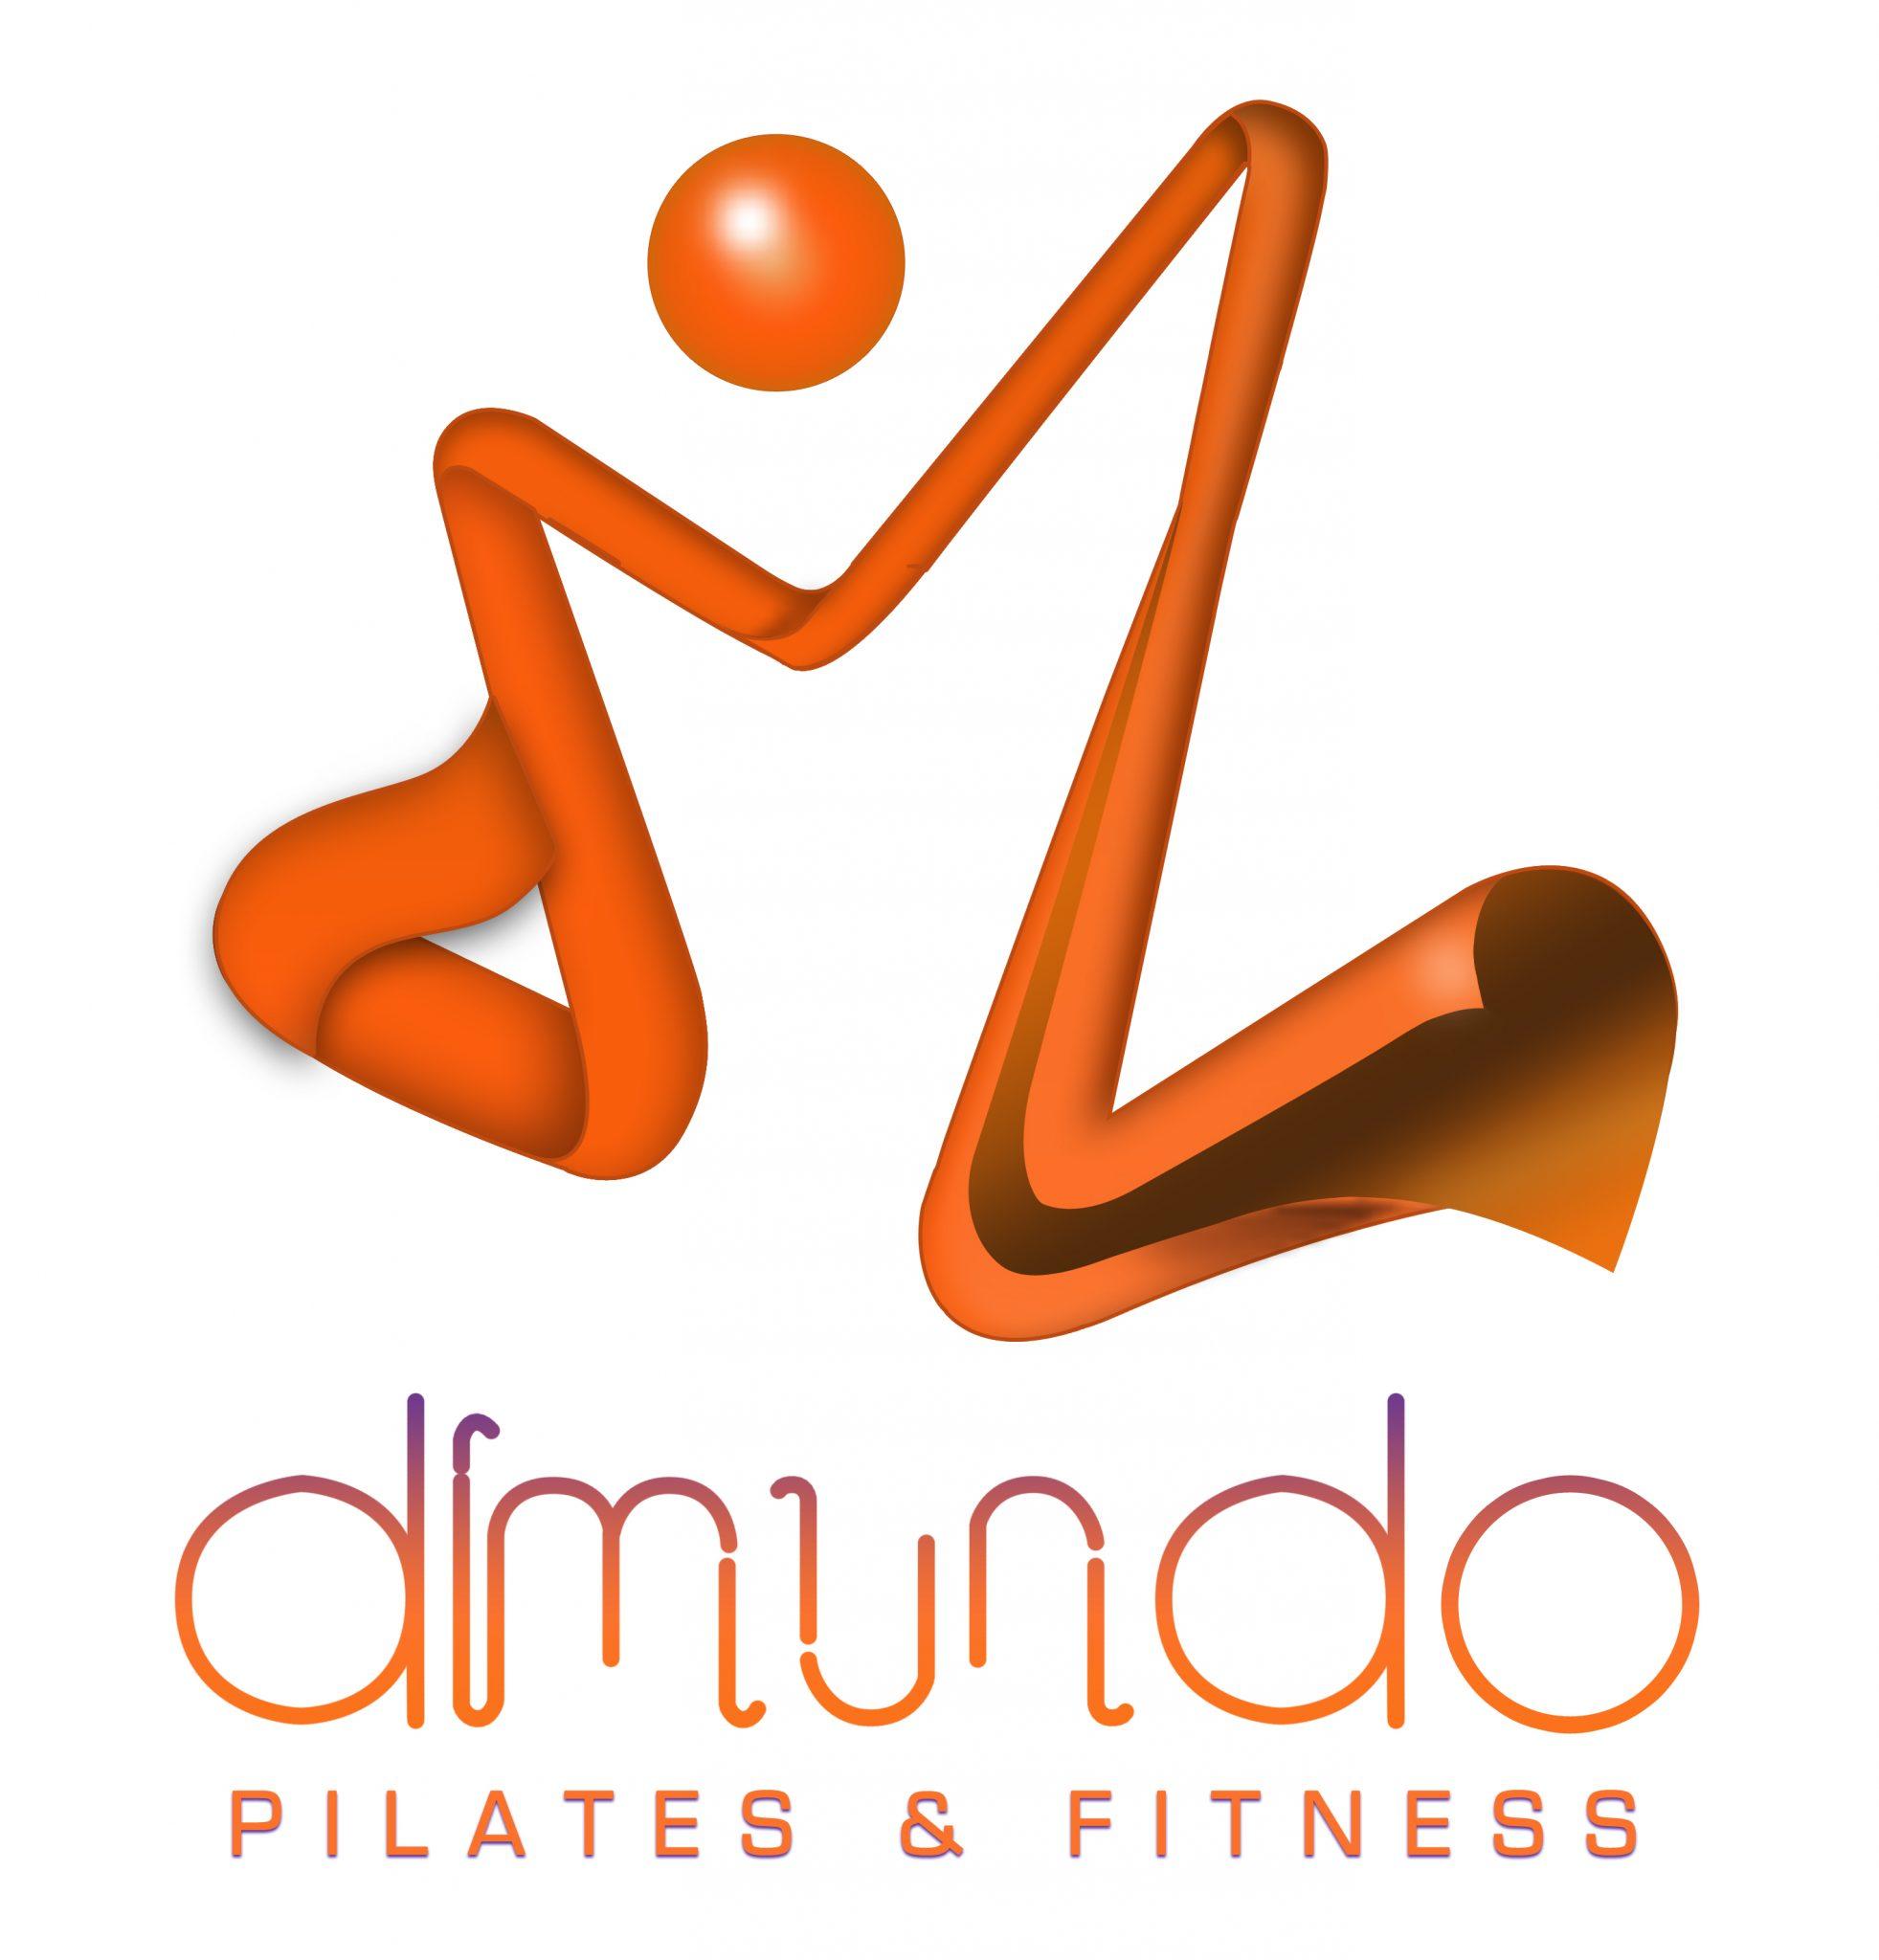 Qu es el cheat meal blog di mundo pilates y fitness for Que significa gym